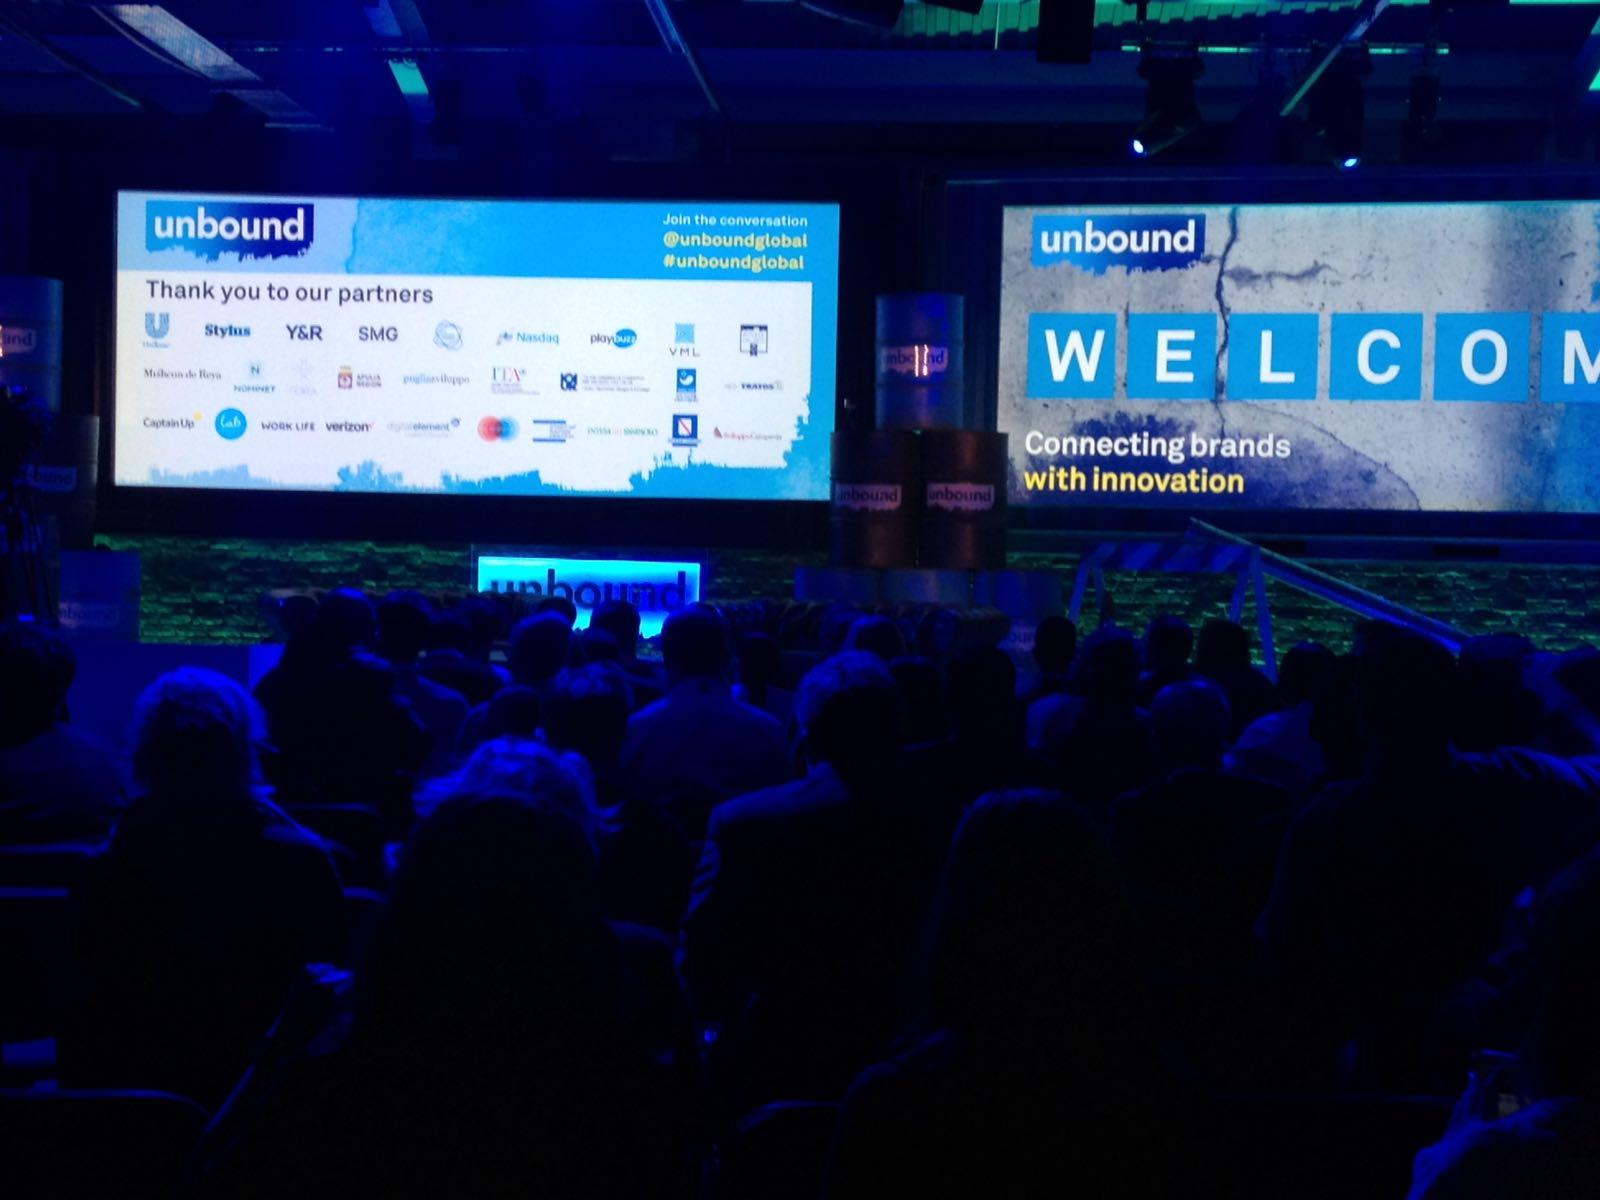 La Campania delle startup protagonista a Unbound Digital 2016